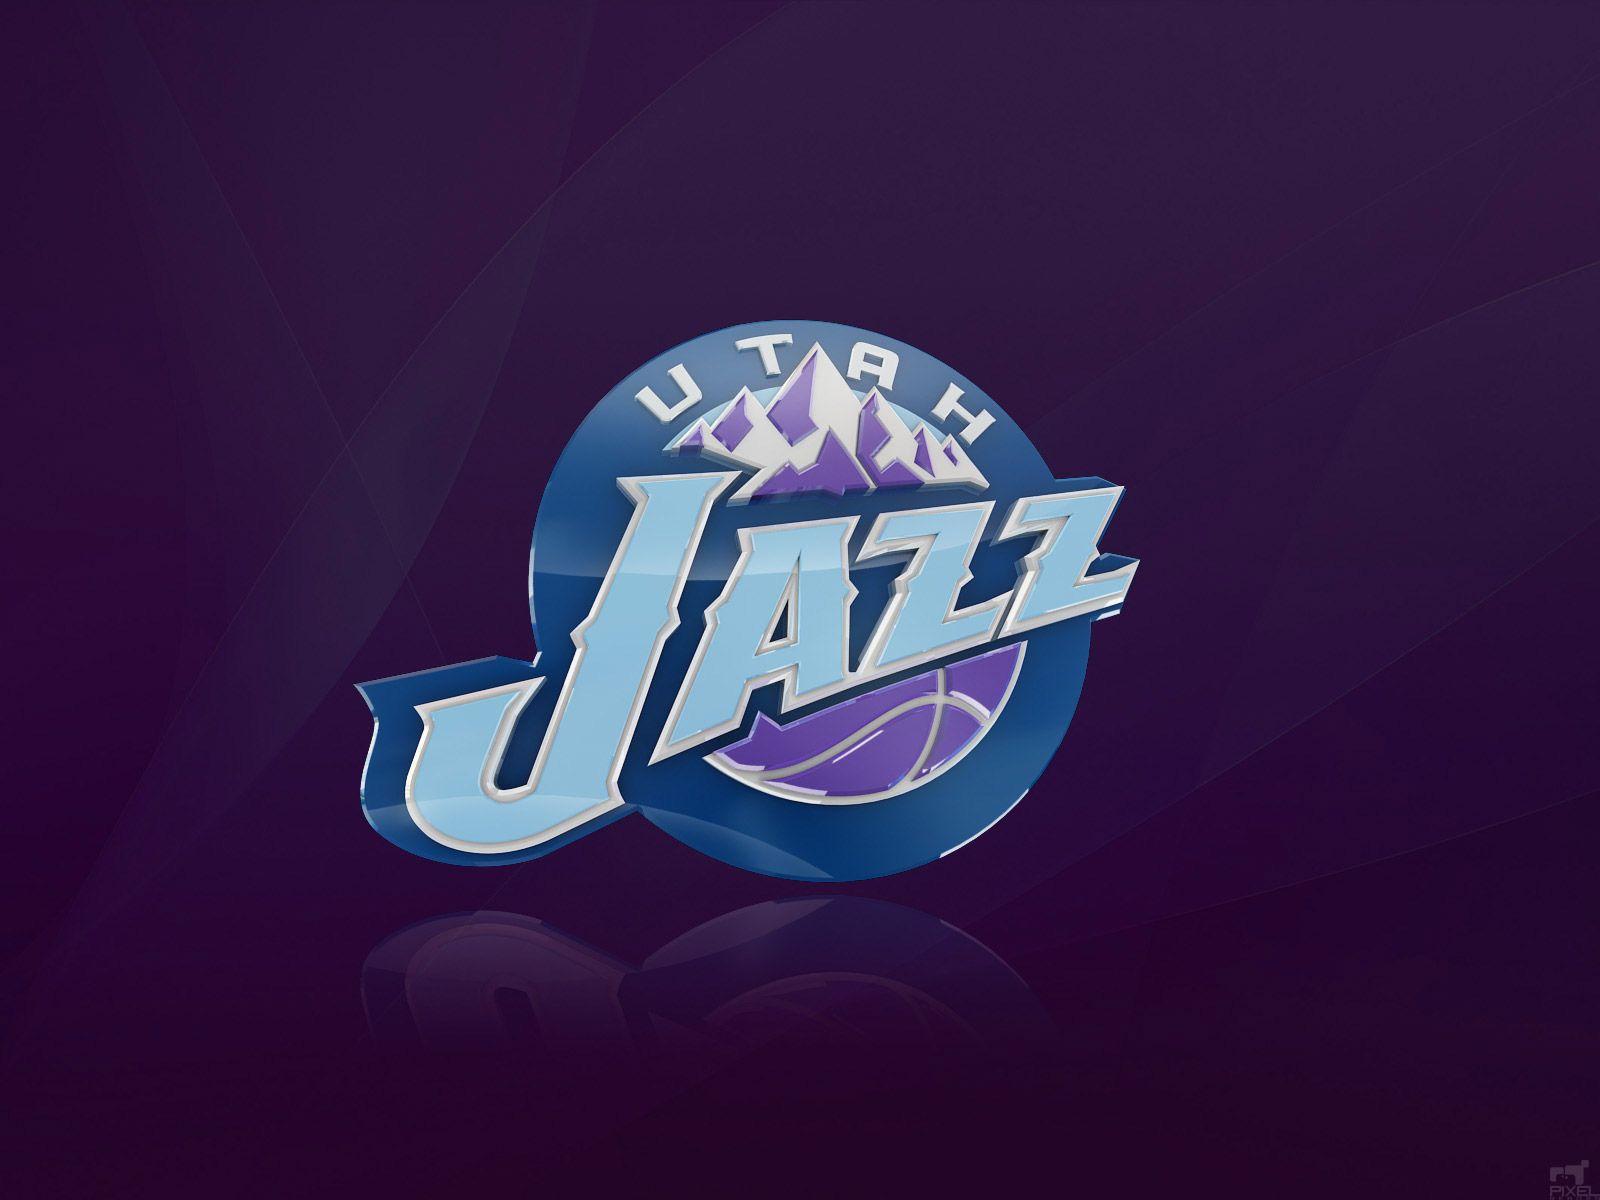 3d Jazz Music Wallpapers: Utah Jazz Wallpapers